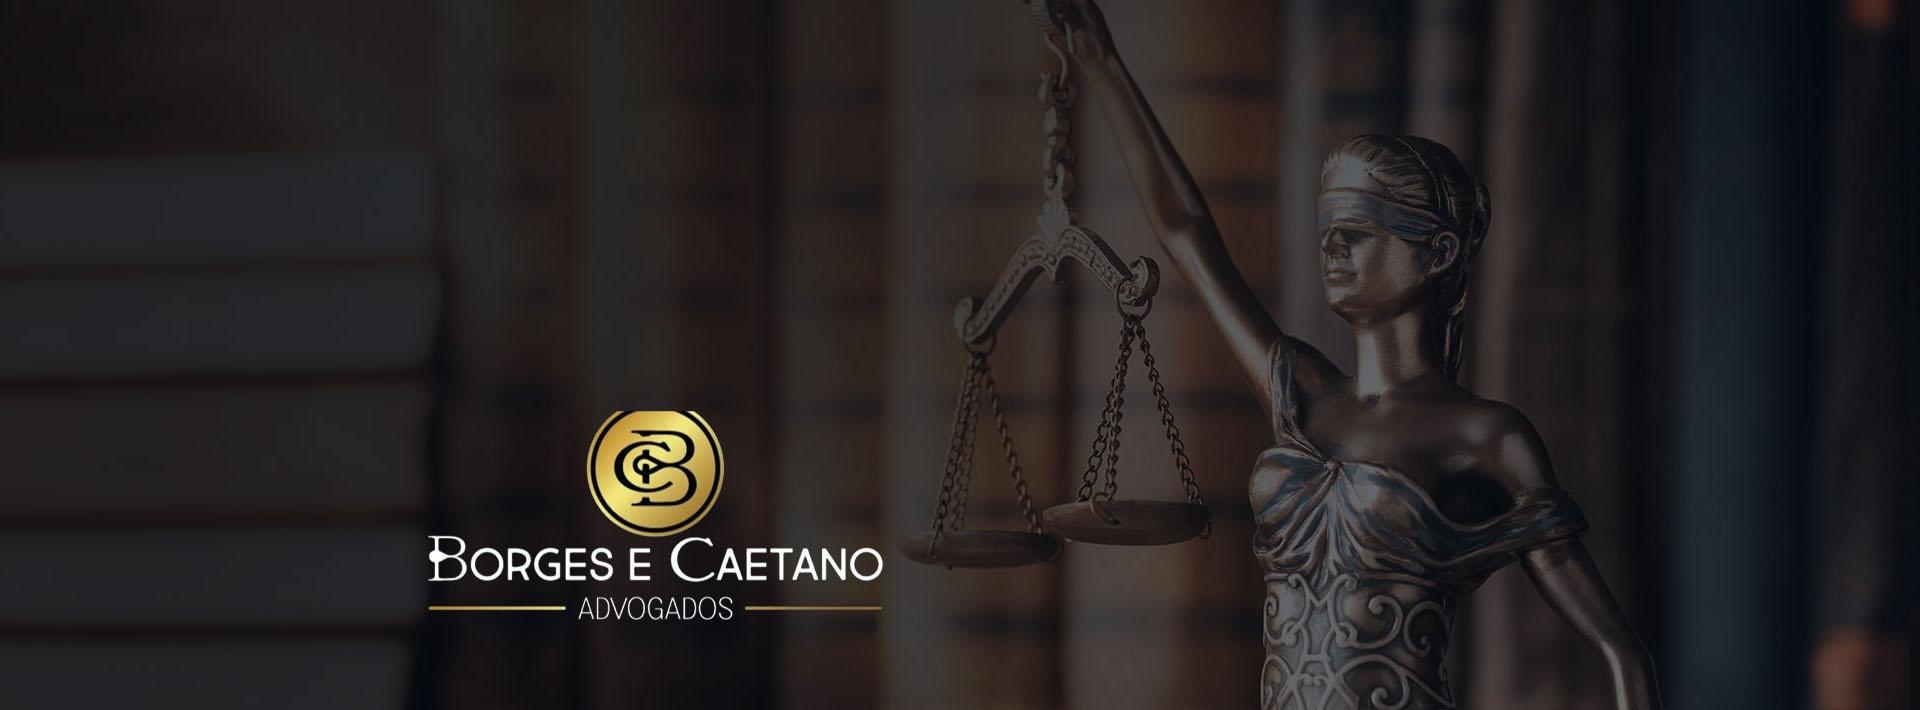 Banner - Borges & Caetano Advogados